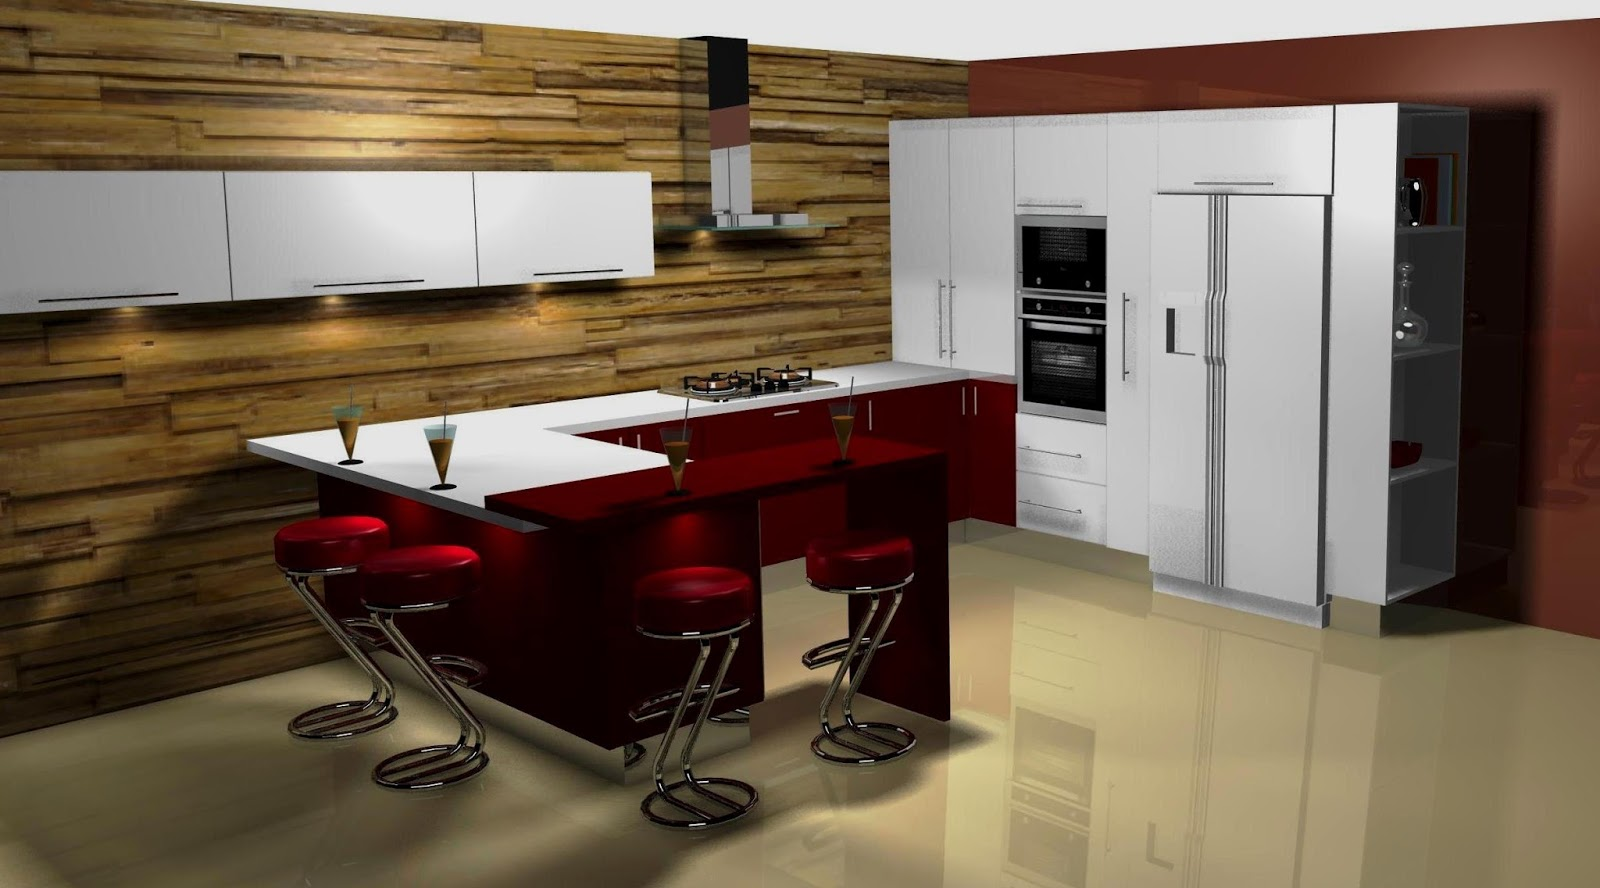 Dise o muebles de cocina dise o de cocina en blanco y burdeos for Cocinas disenos 2016